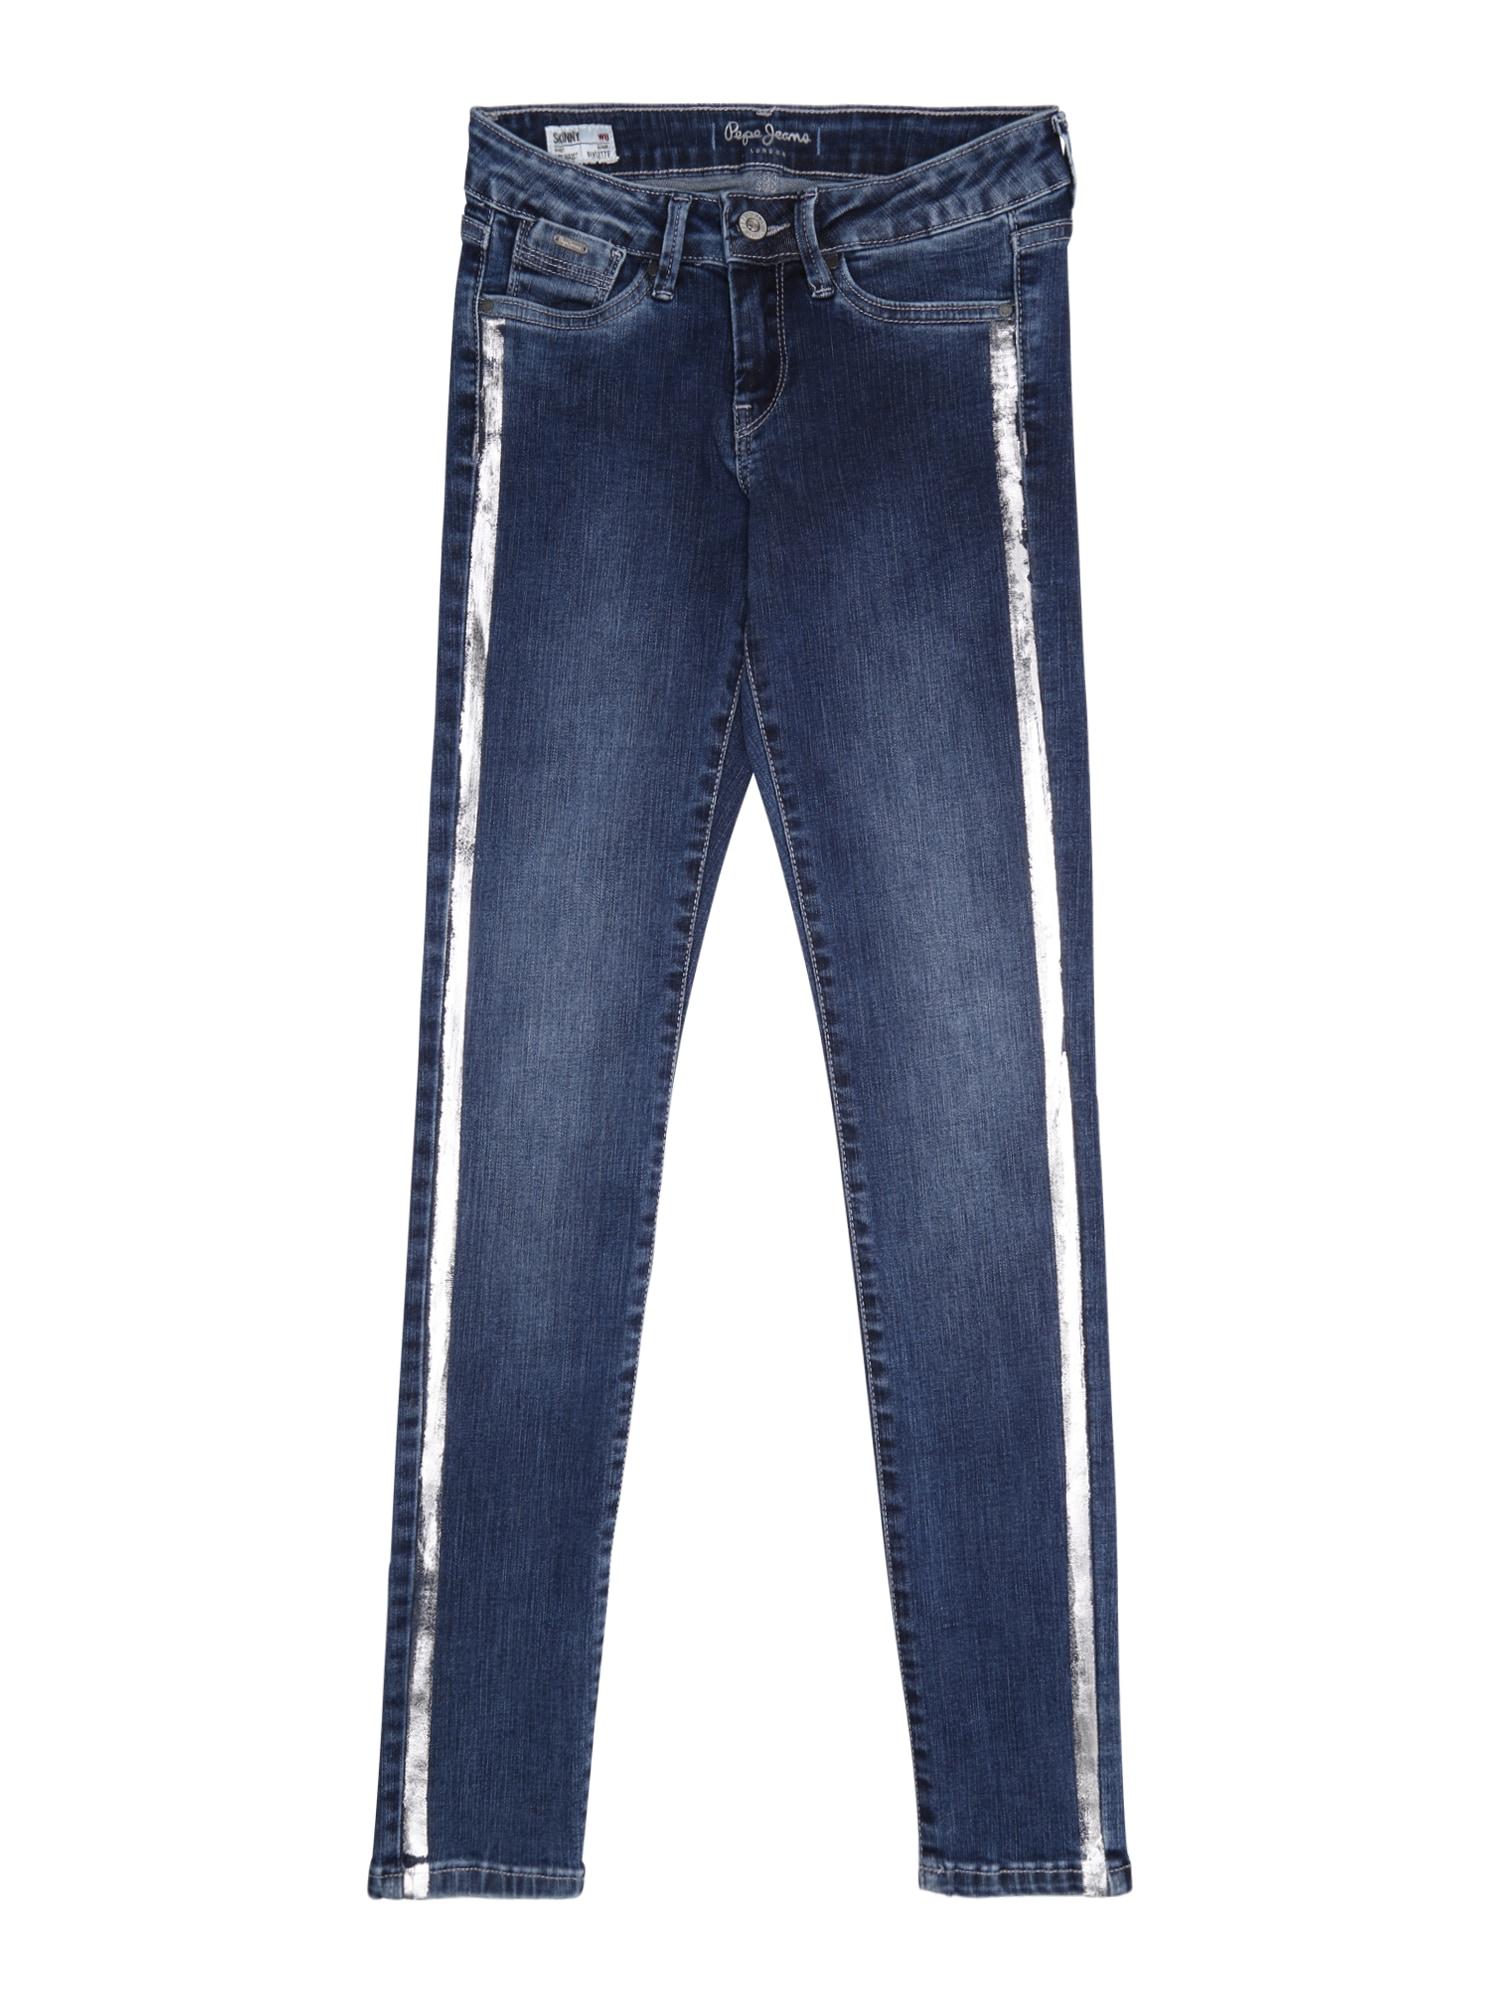 Pepe Jeans Meisjes Jeans PIXLETTE SPARKLE blauw denim zilver